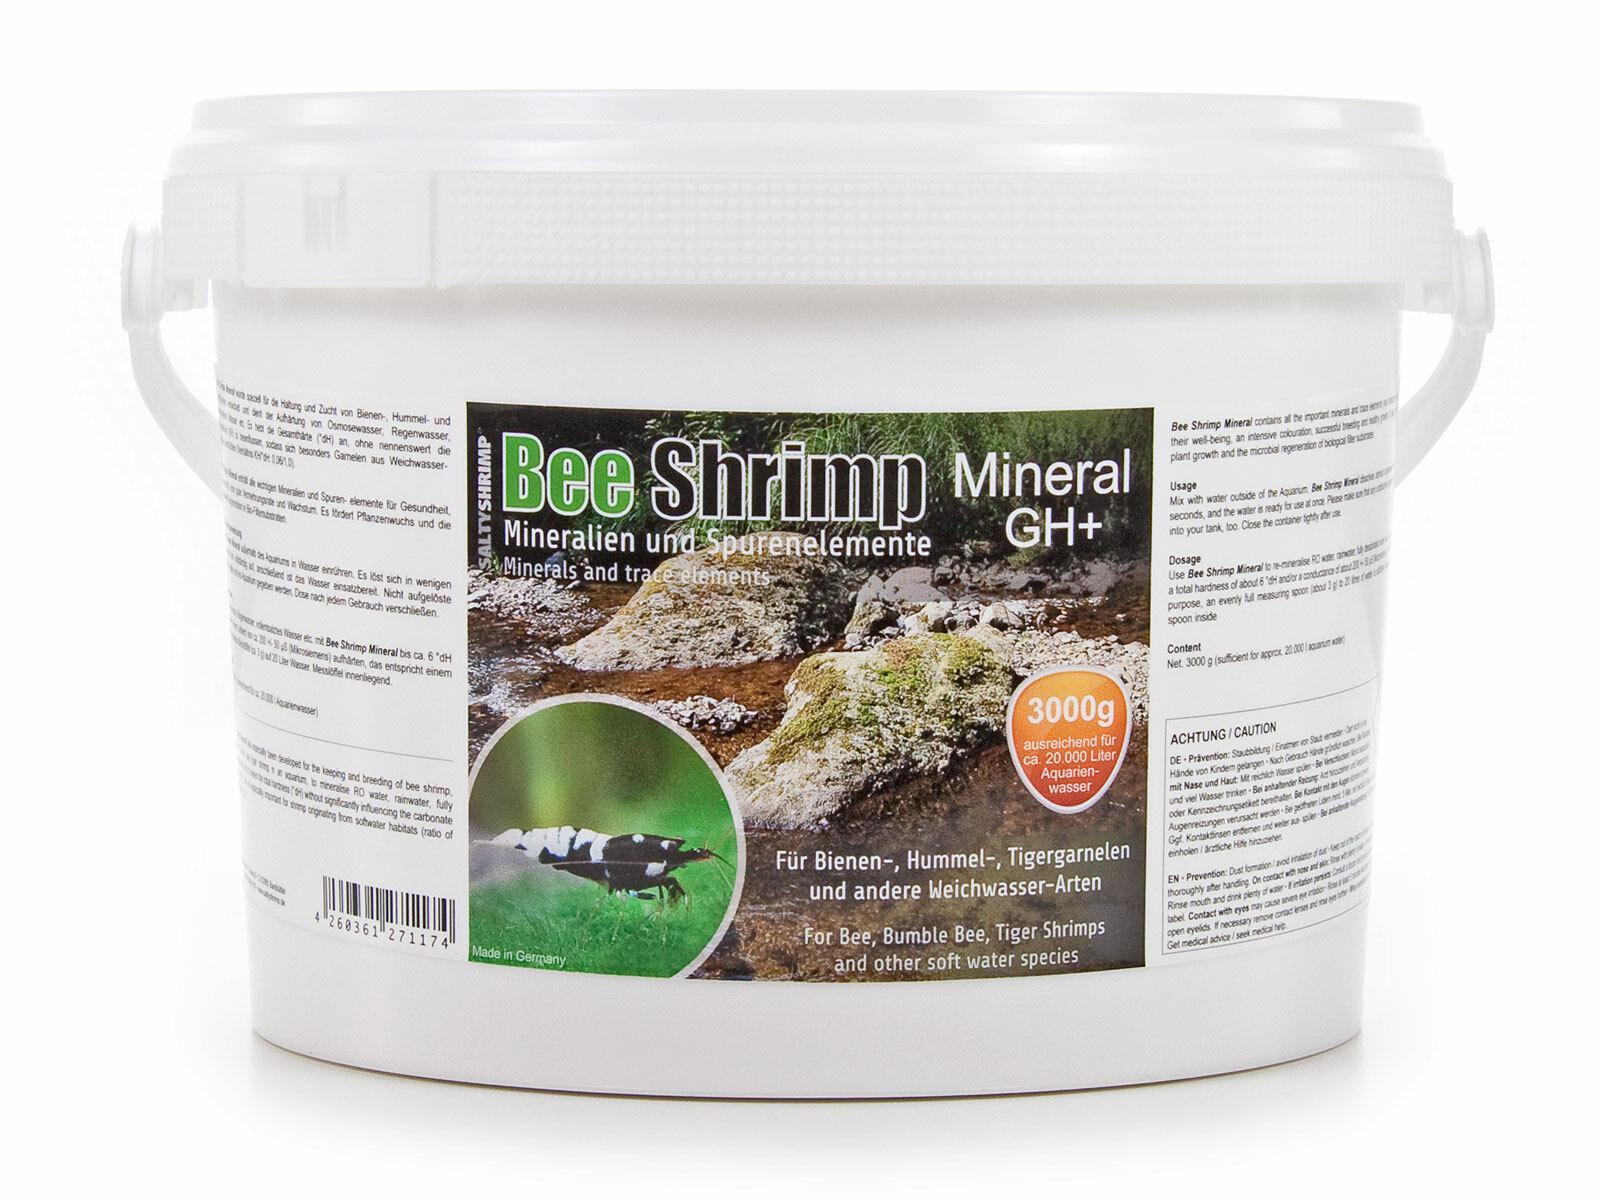 kg saltyshrimp Bee Shrimp GH minerale , 3000g 3kg Salty Shrimp